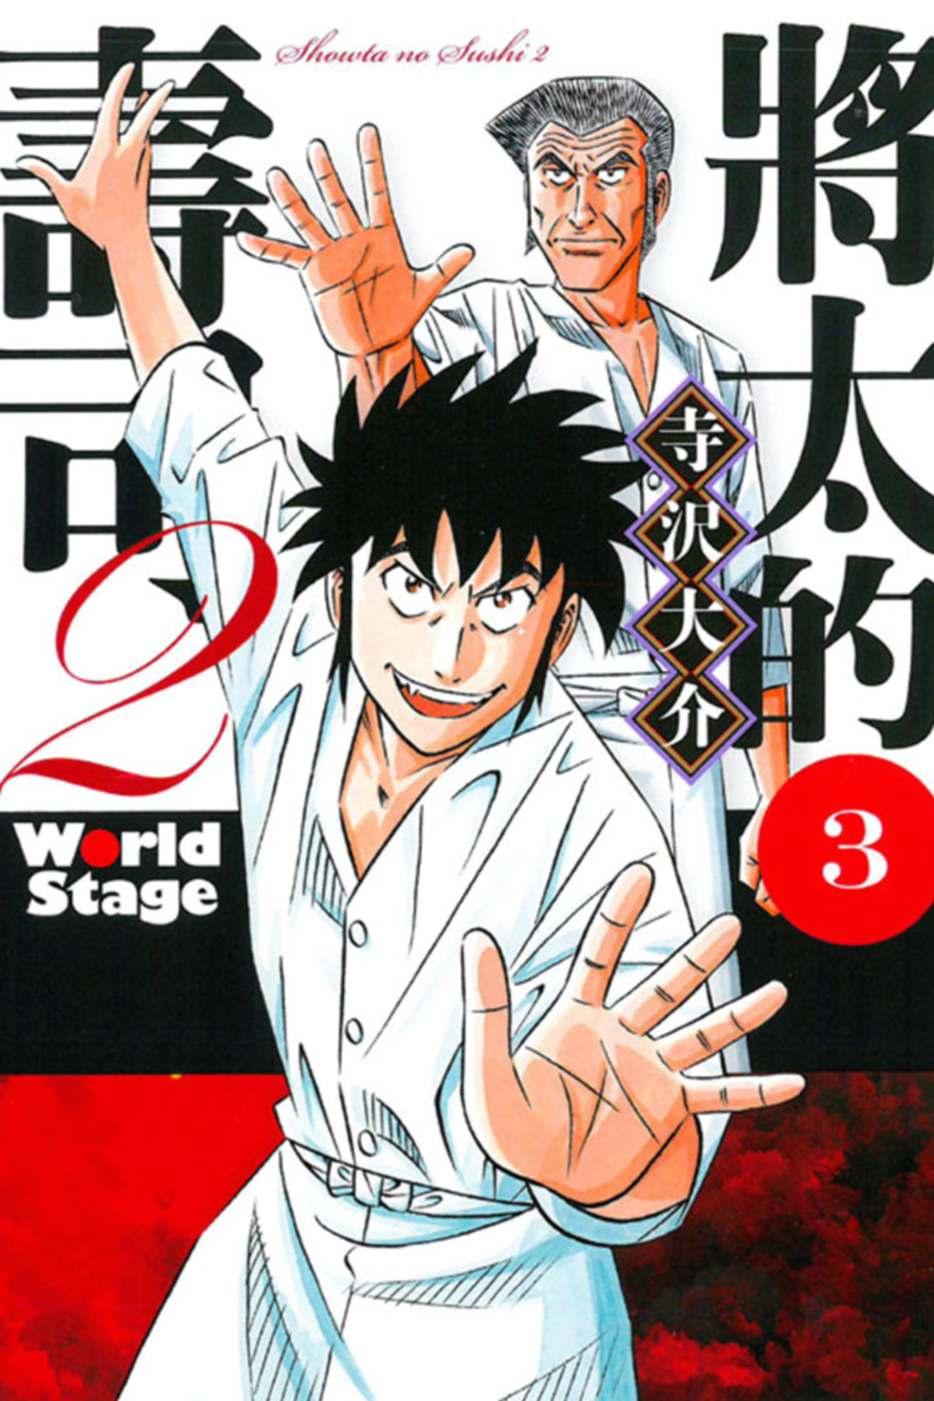 將太的壽司2 World Stage 3